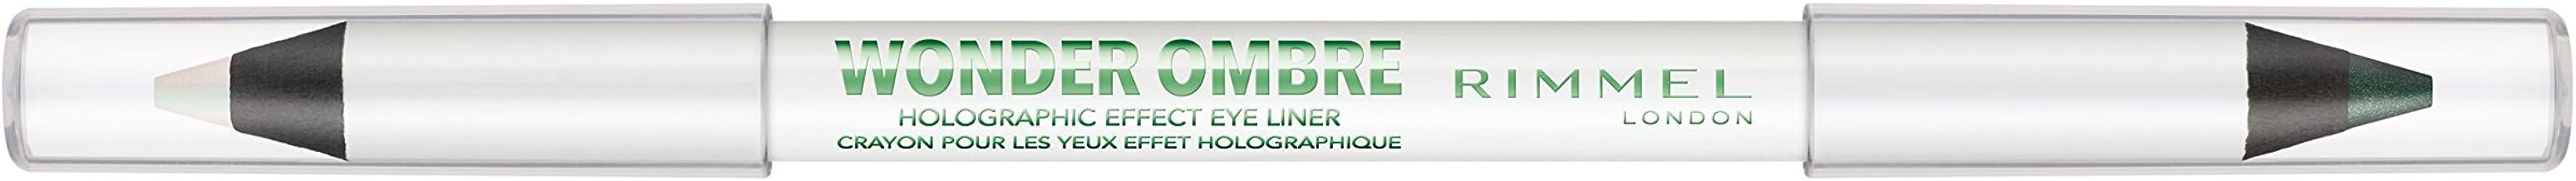 Rimmel Wonder Ombre Eye Liner, Galactic Green, 0.04 Ounce